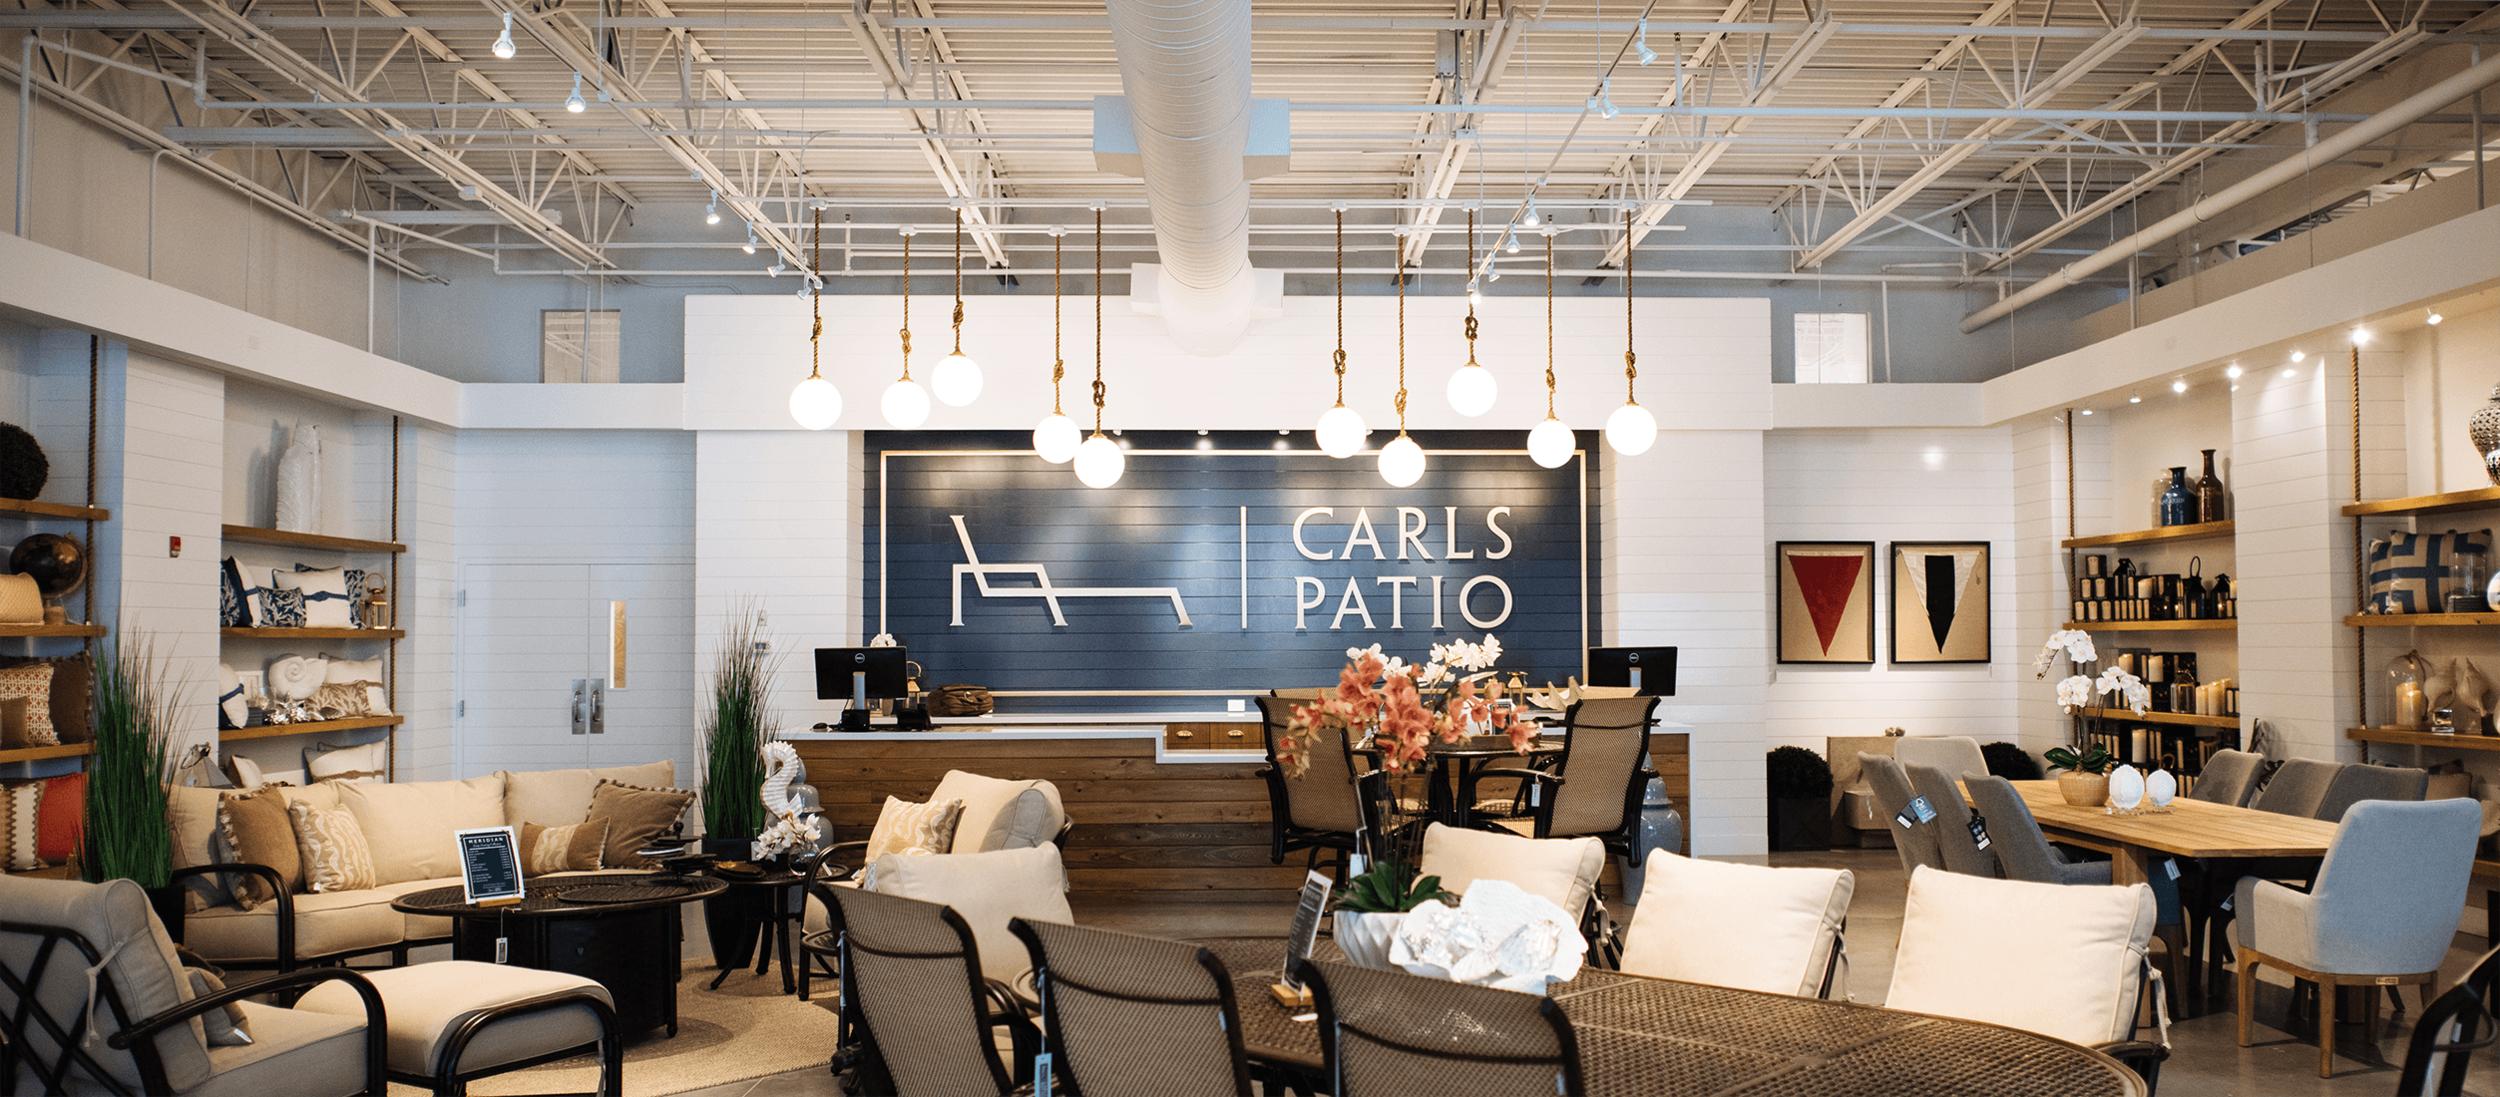 CARL'S PATIO  |  Tampa, FL